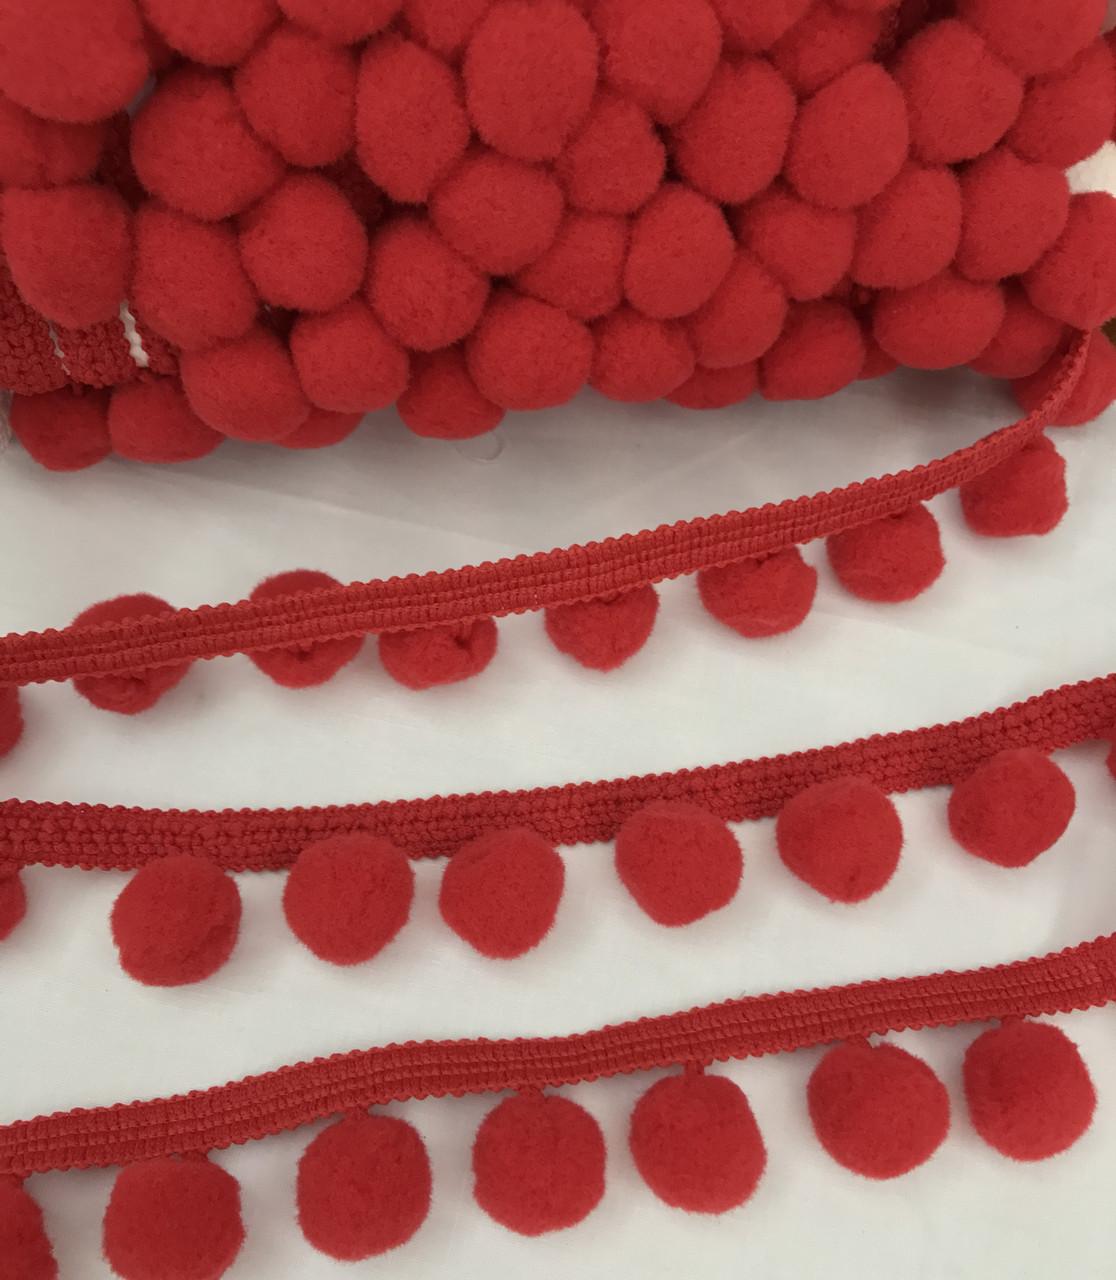 Тесьма с помпонами красная 20 мм